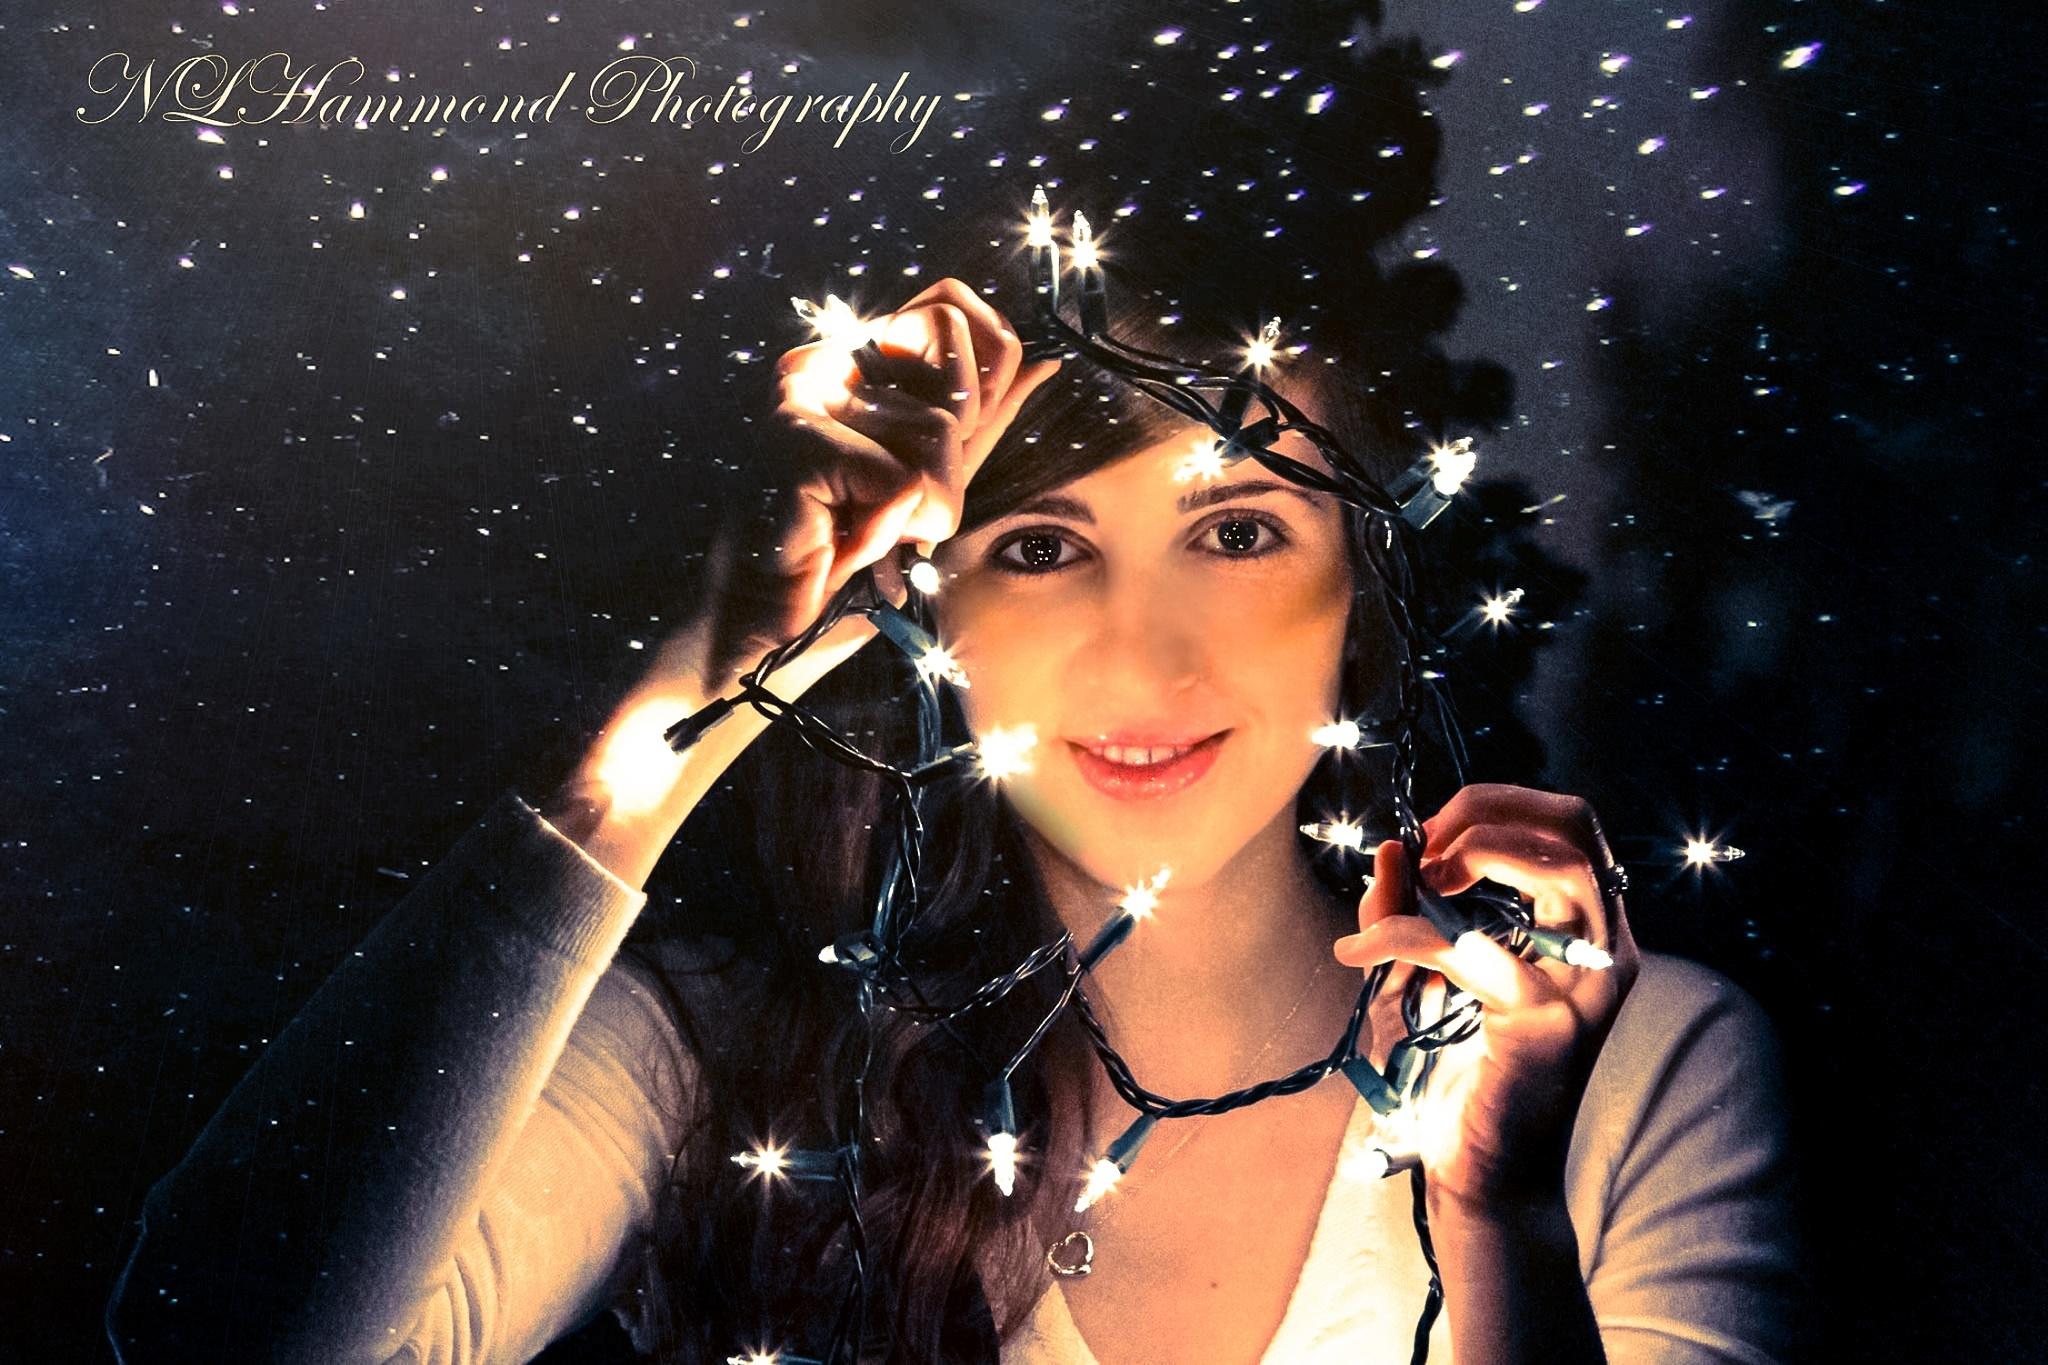 Magical Sara Beara by NLHammondPhotography